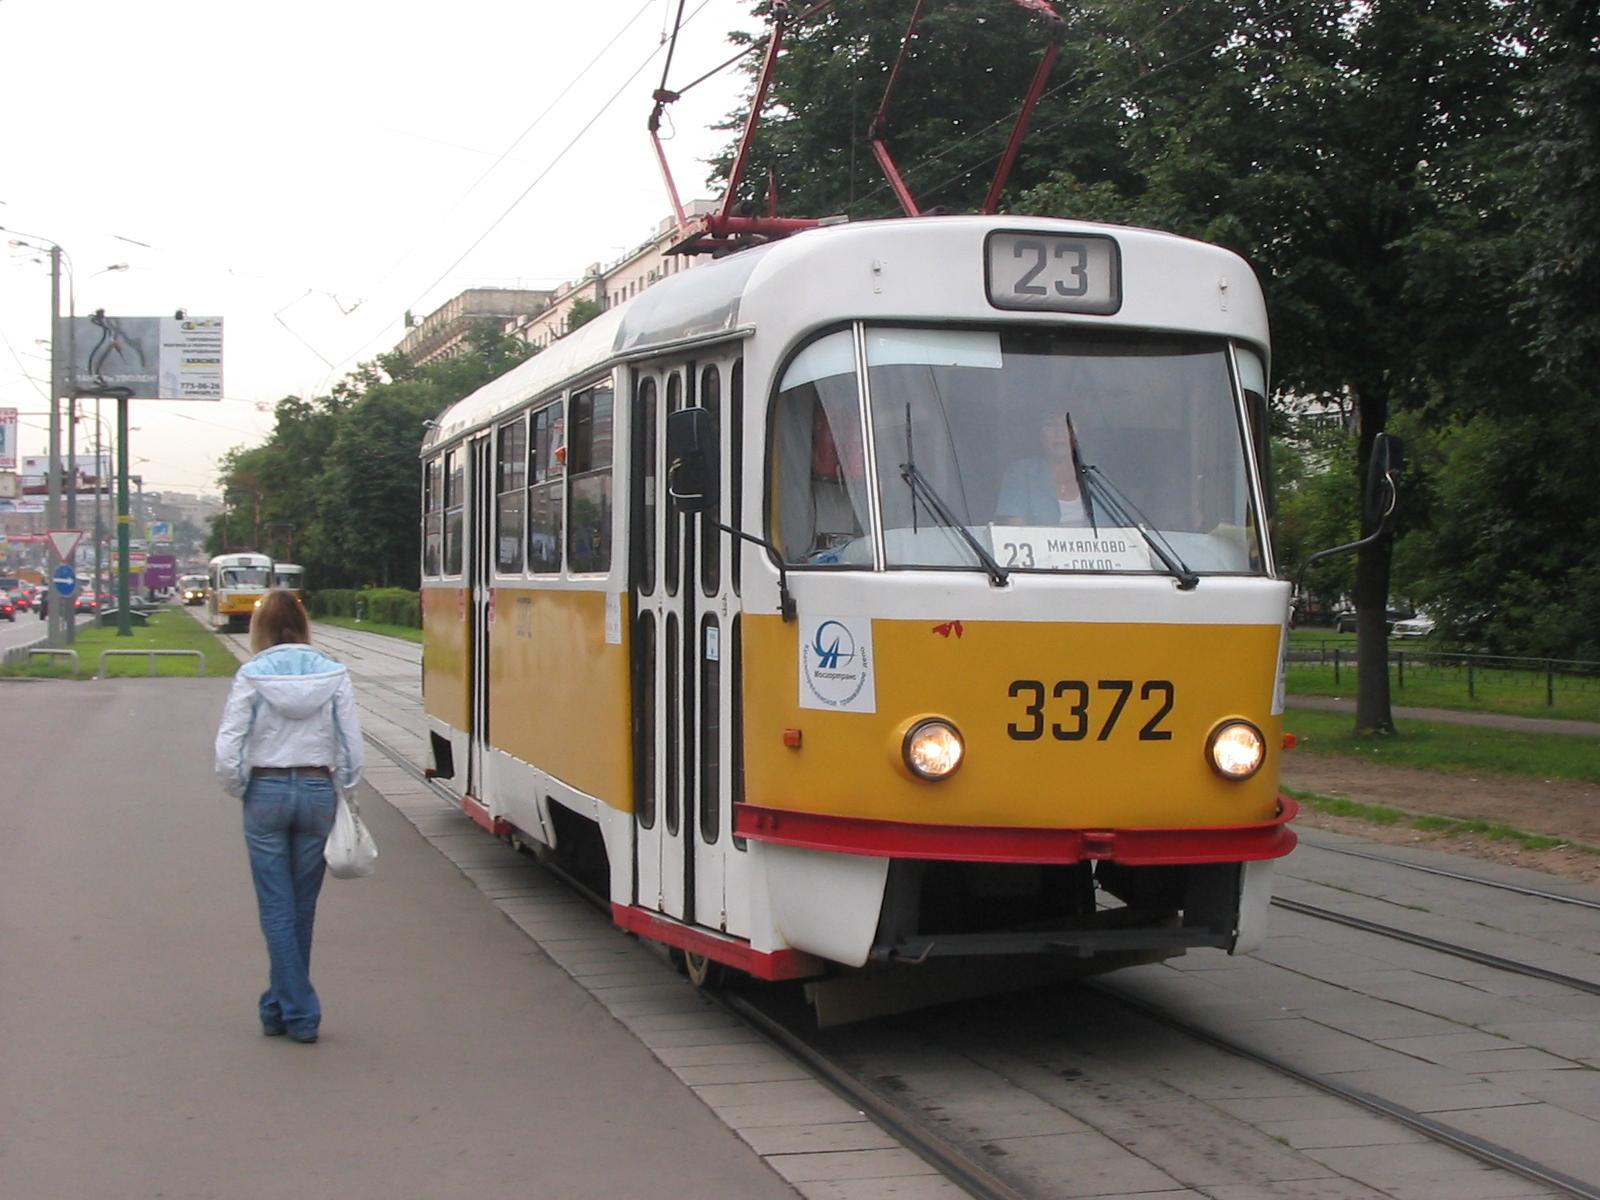 File:Tramvai Moscow 3372-23.jpg